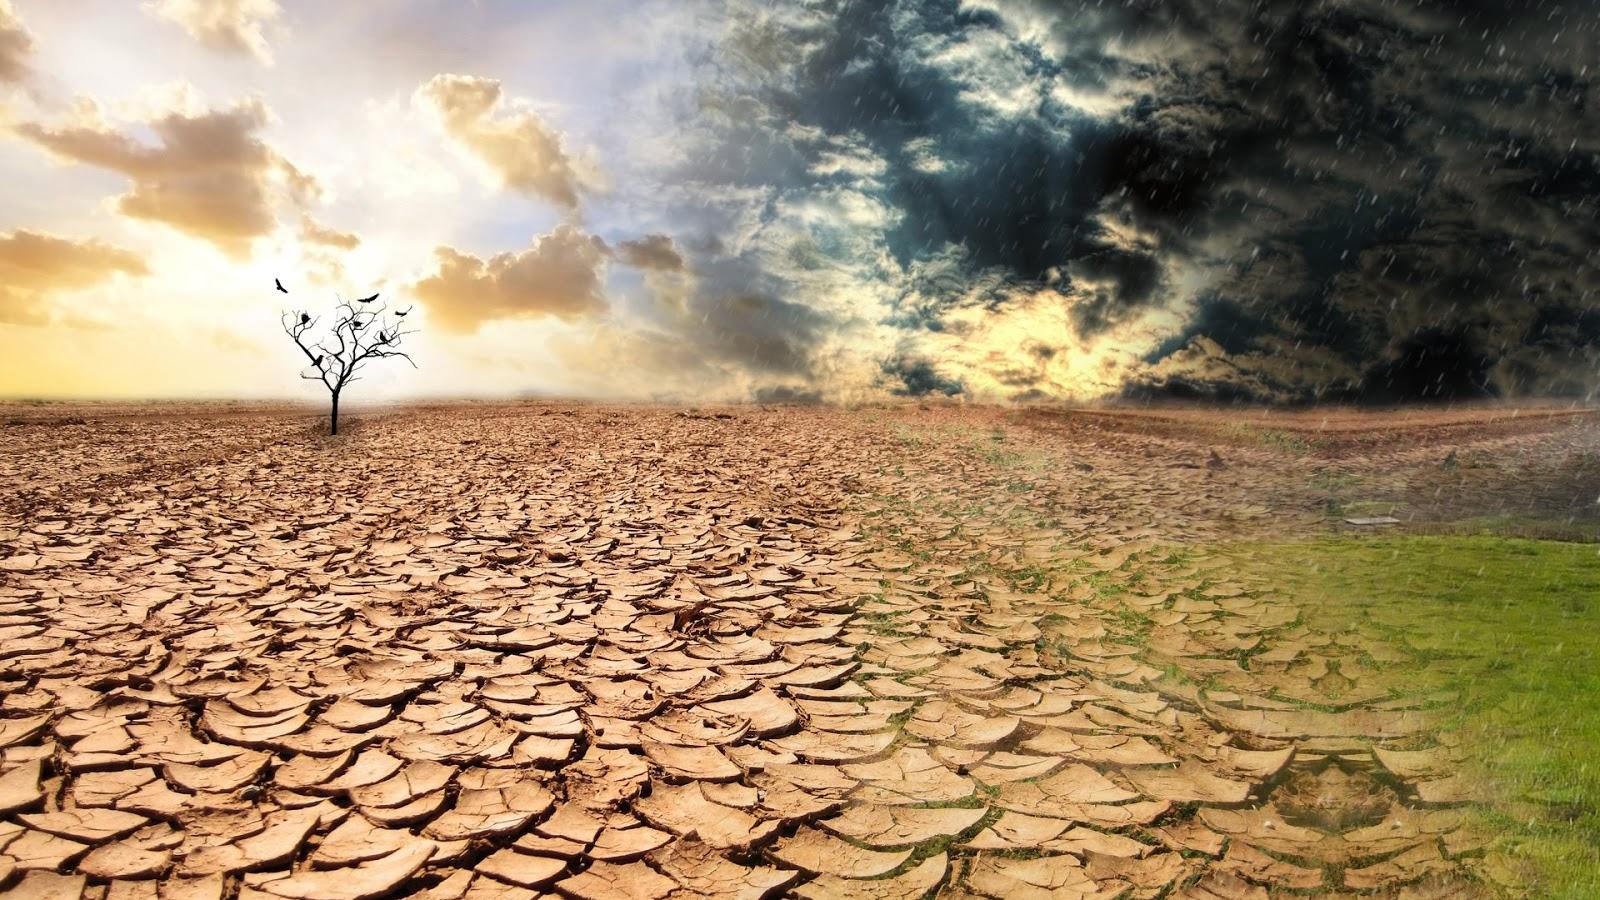 http://statik1.enerjienstitusu.com/wp-content/uploads/r%C3%BCzgar-ve-g%C3%BCne%C5%9F-enerjisi56-696x391.jpg